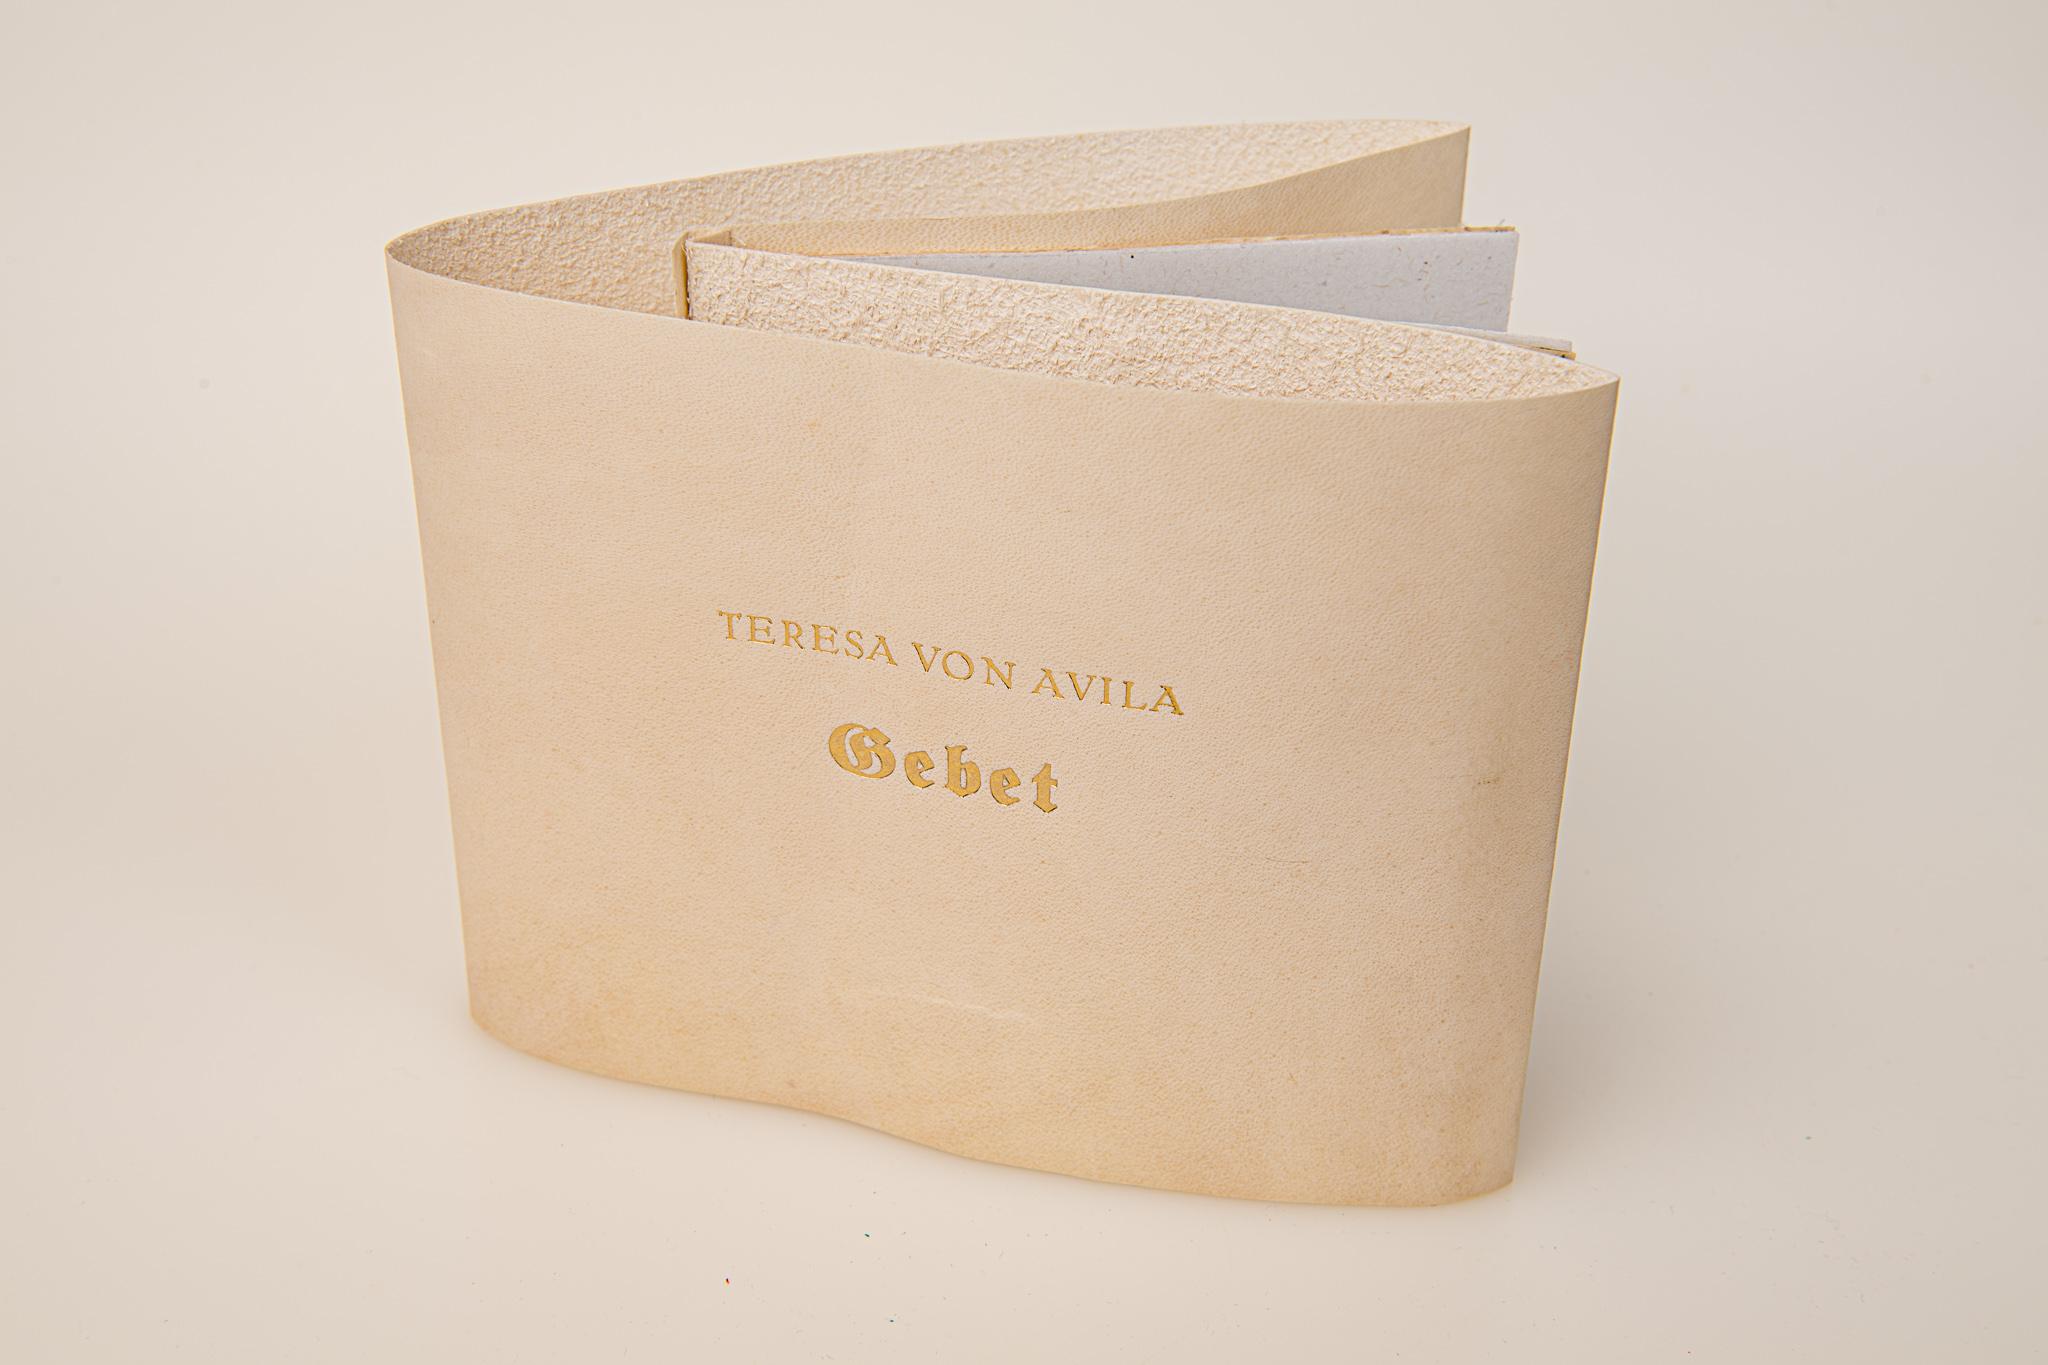 Gebet, Teresa von Avila, Pergamentbroschur, verkauft